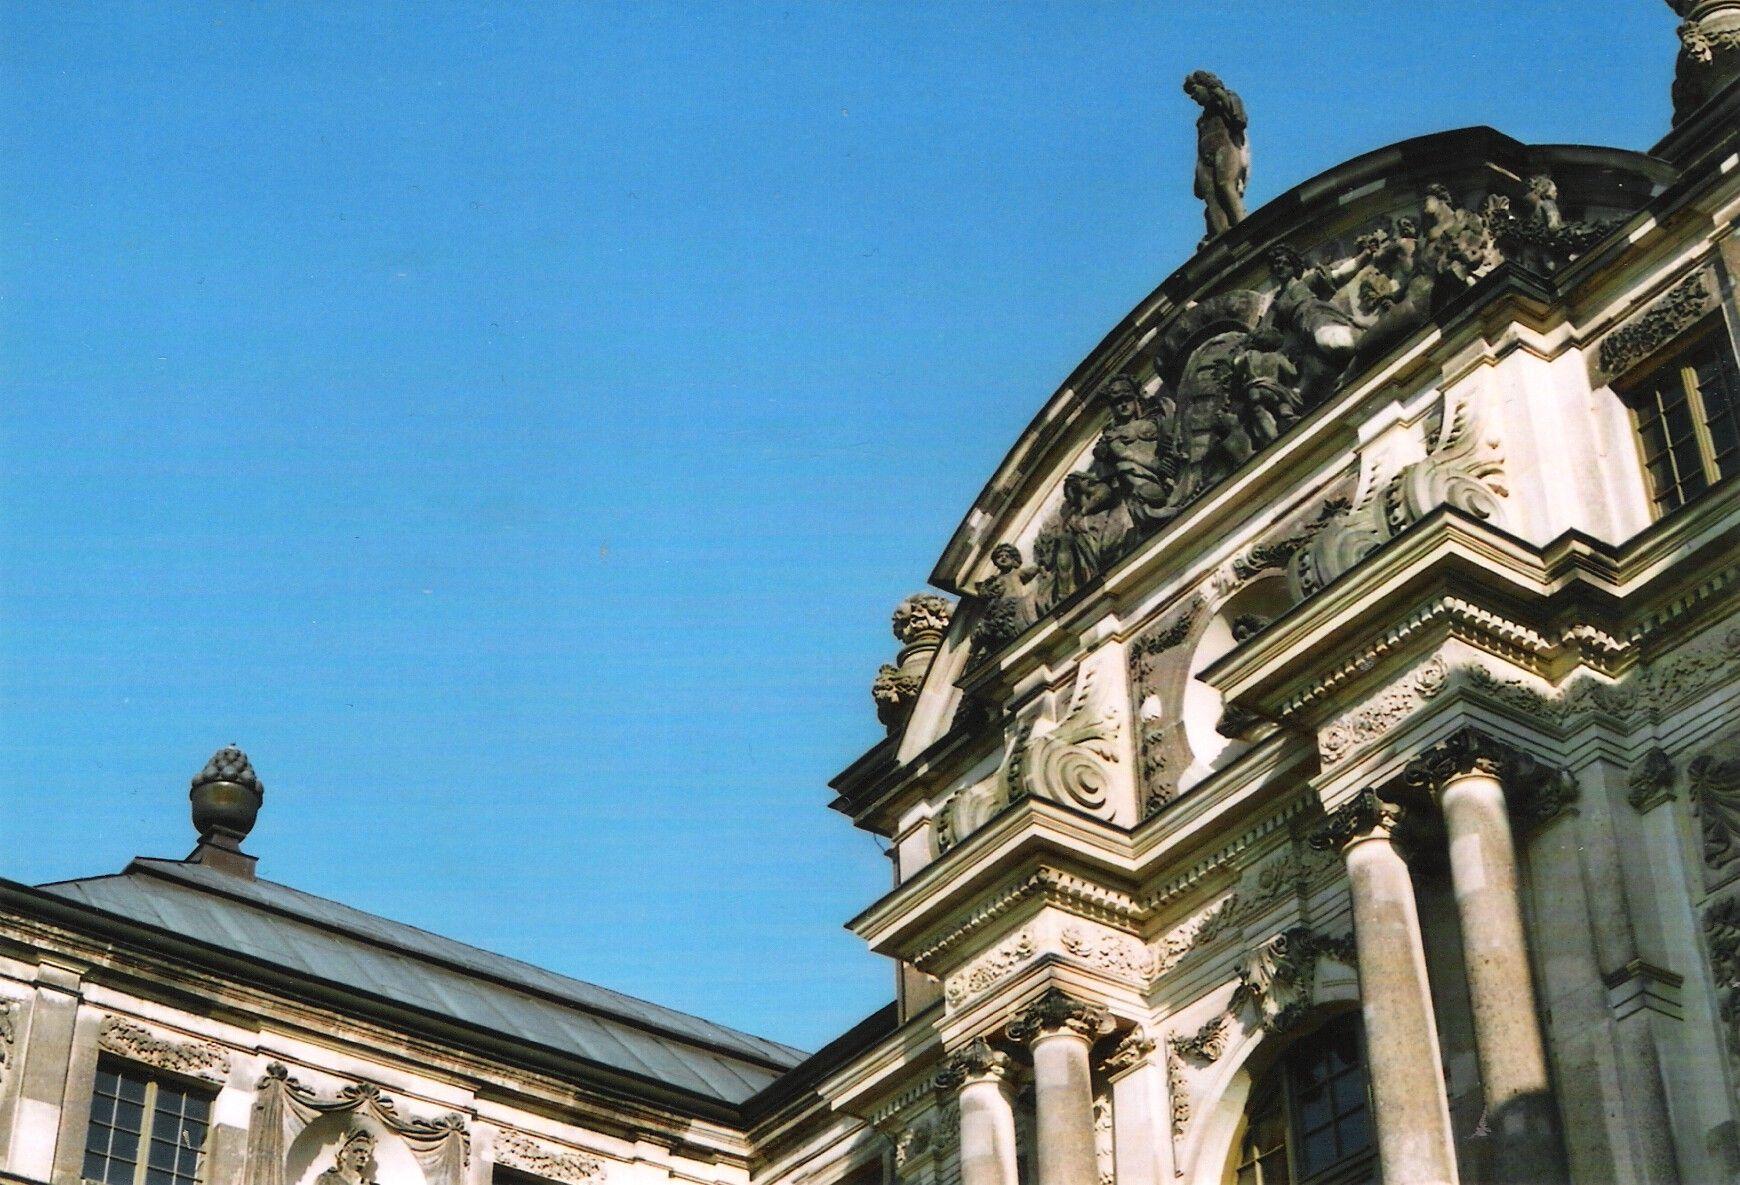 Palais Im Grossen Garten Garten Pictures Landmarks